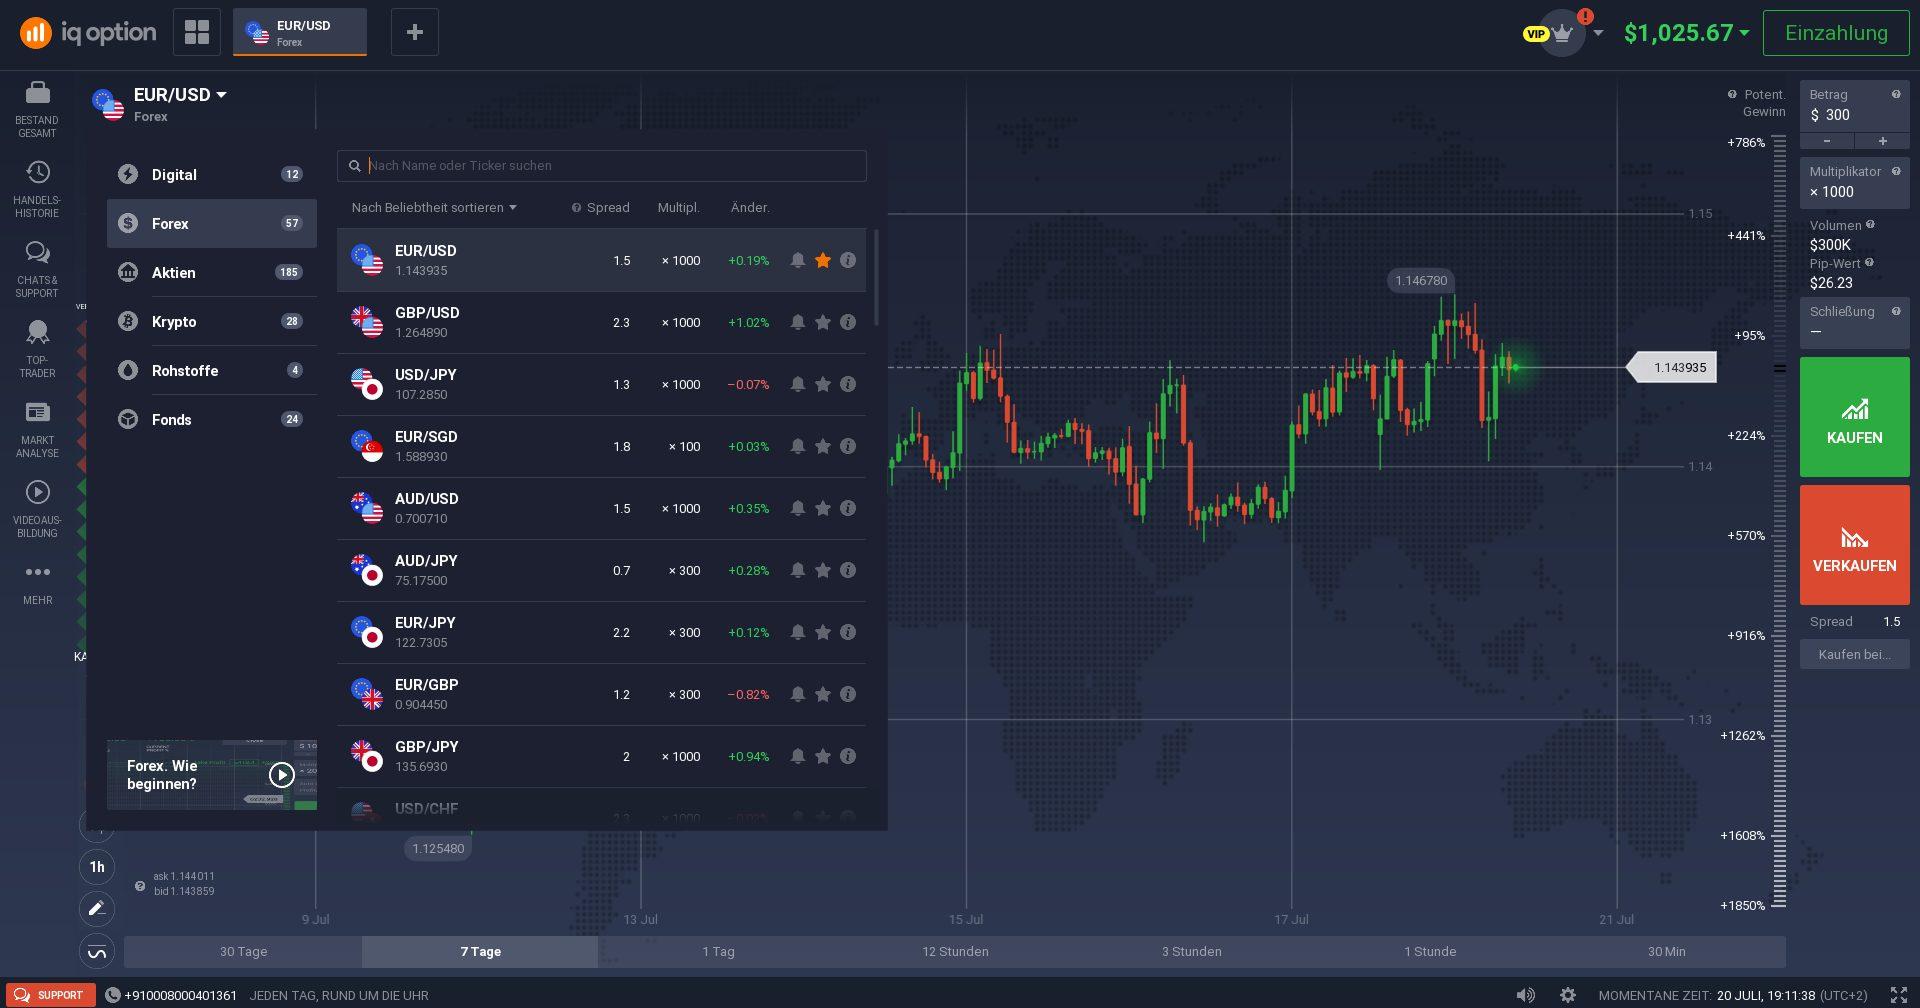 IQ Option Plattform Screenshot